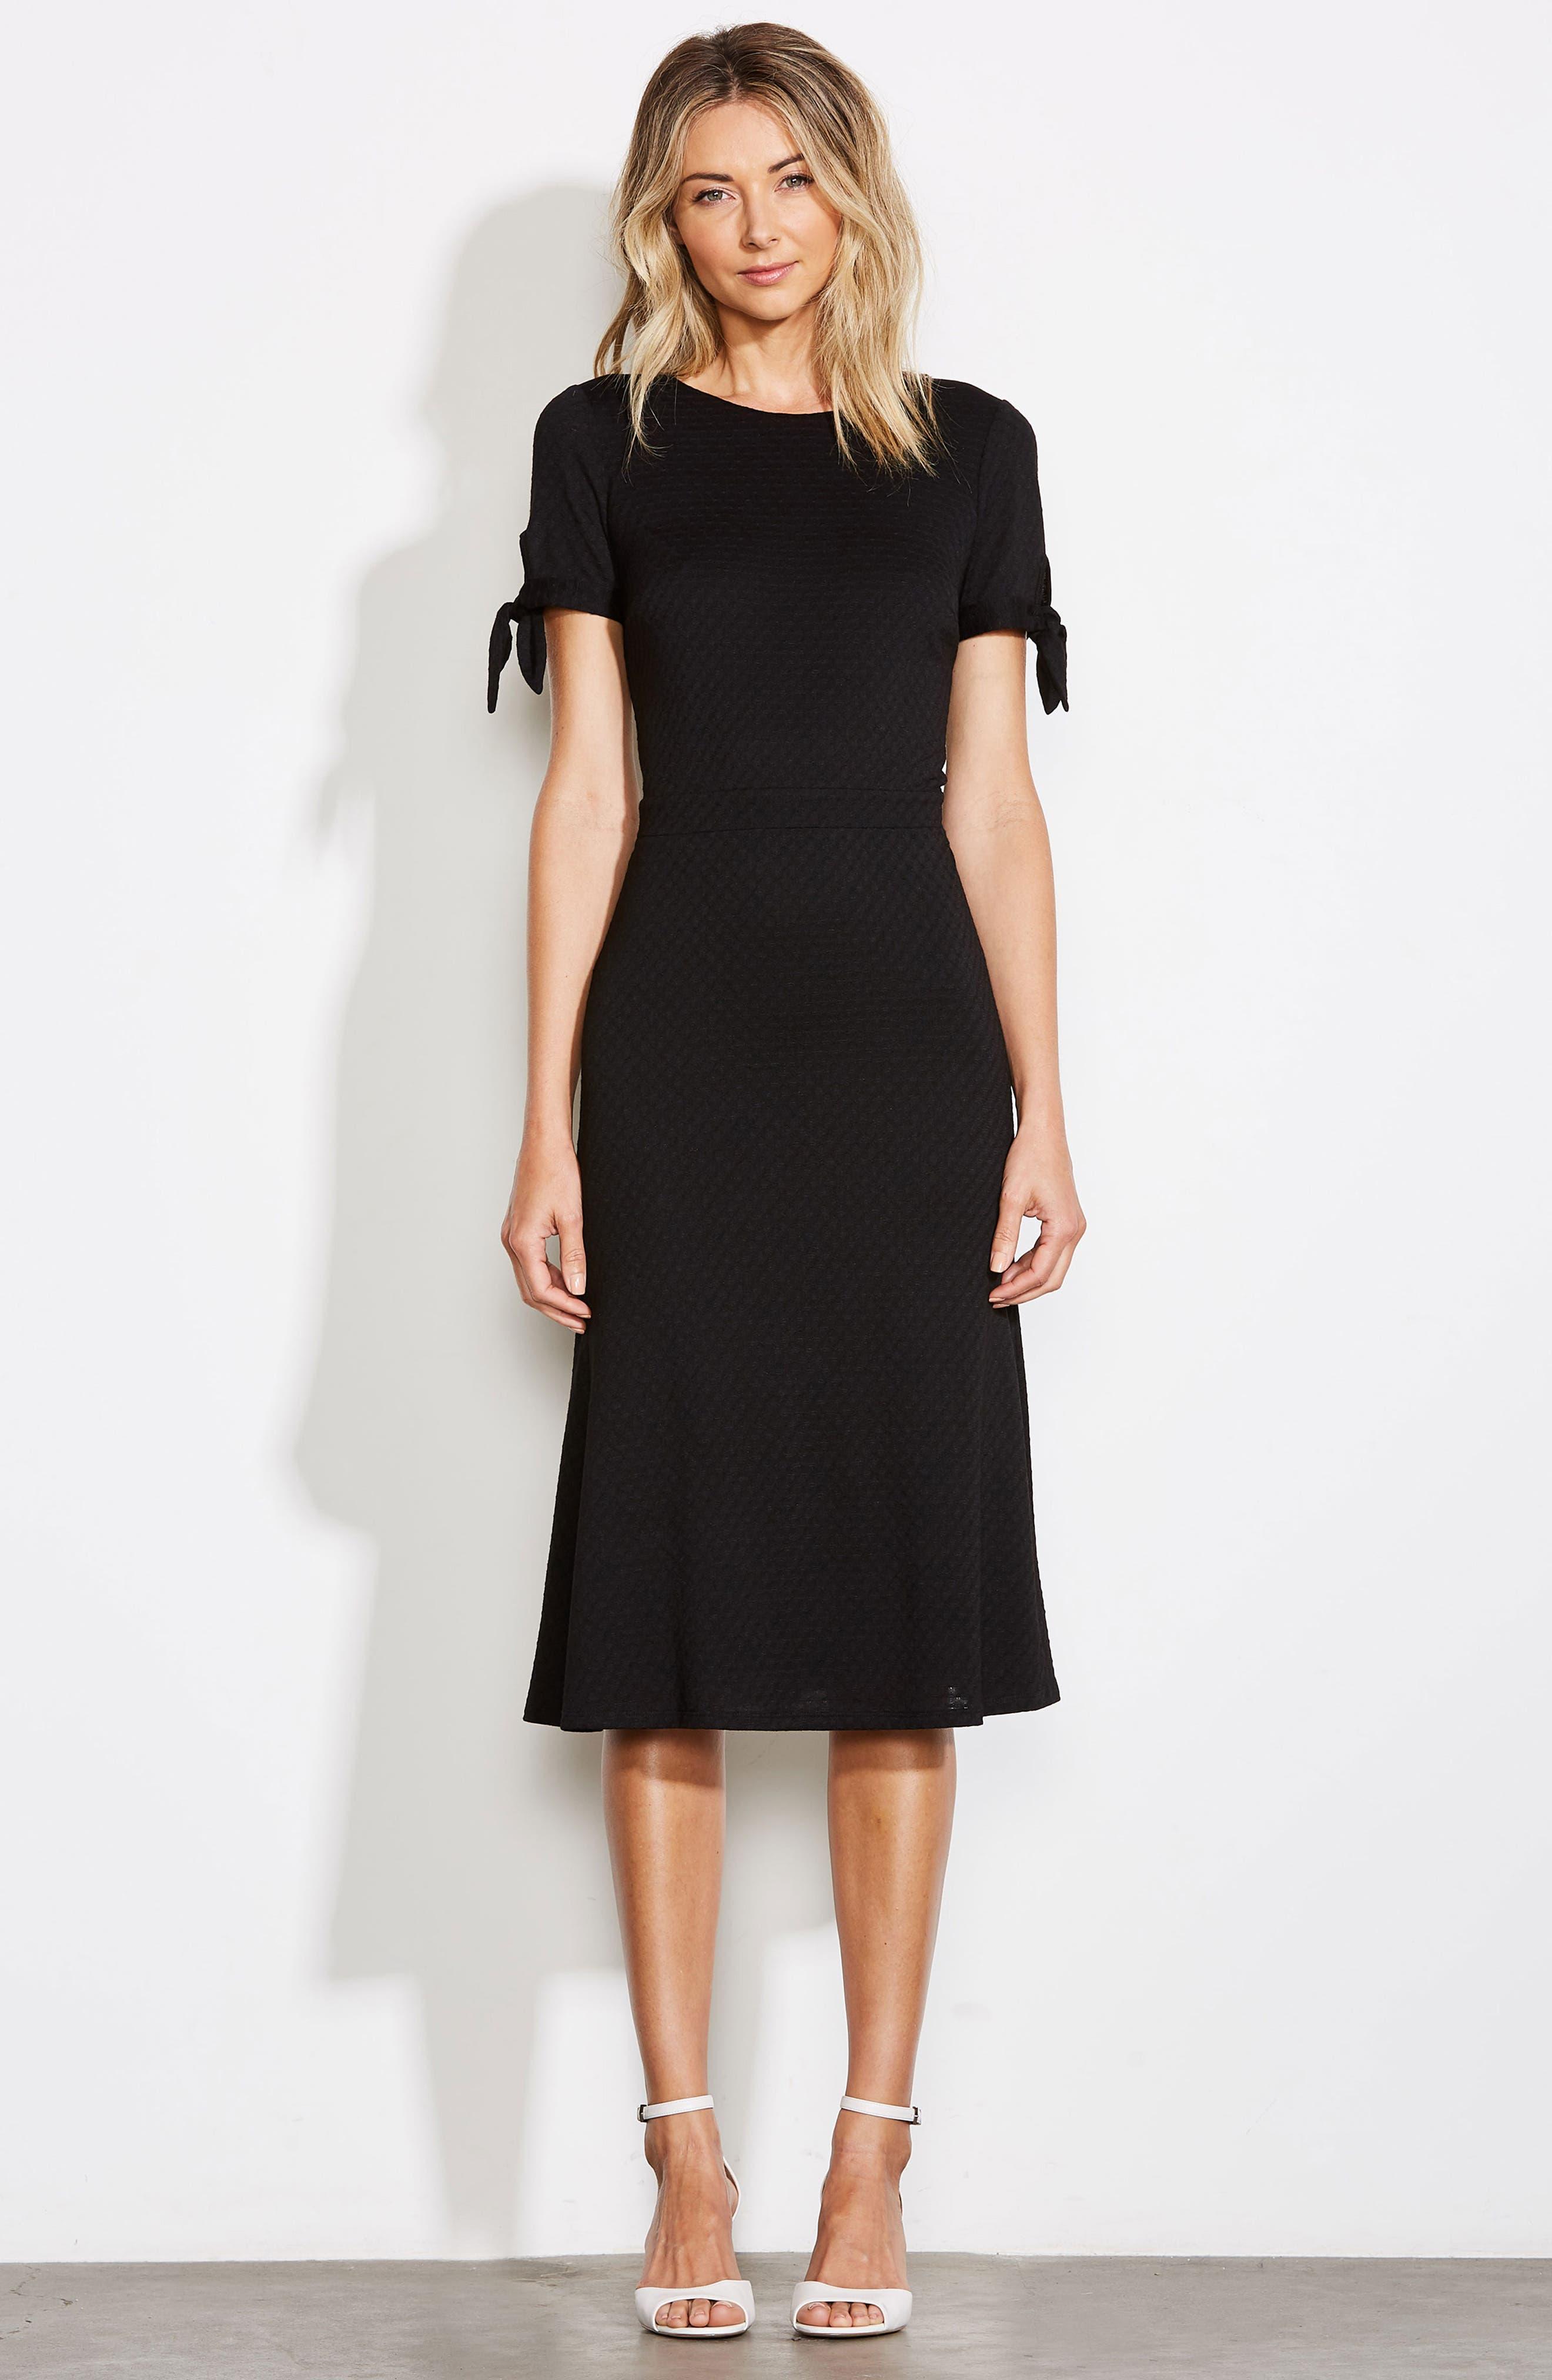 ALI & JAY, Bunker Hill Textured Midi Dress, Alternate thumbnail 8, color, 001